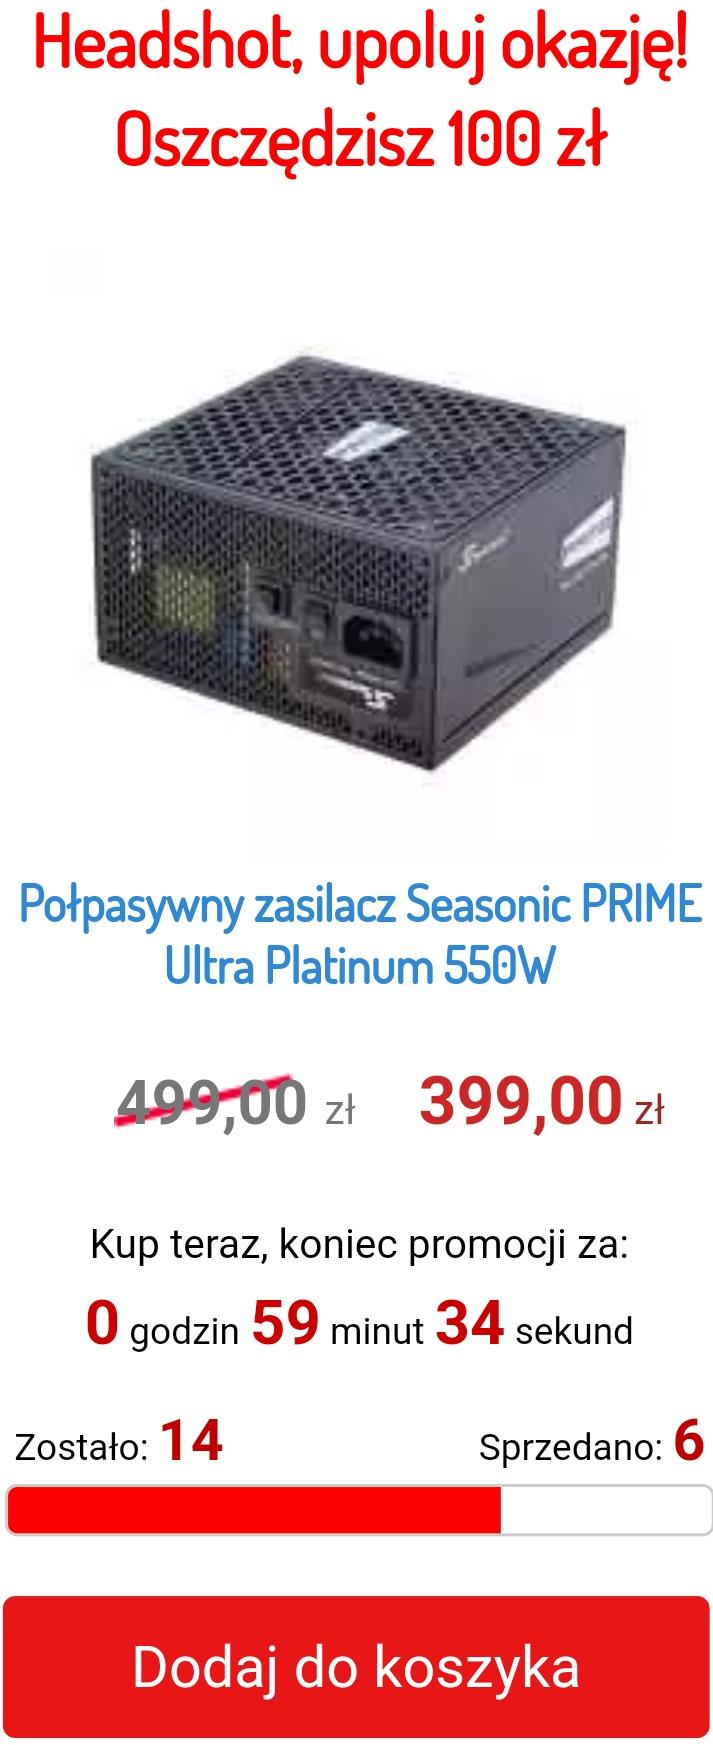 Zasilacz Seasonic PRIME Ultra Platinum 550W (SSR-550PD2) 80Plus Platinum